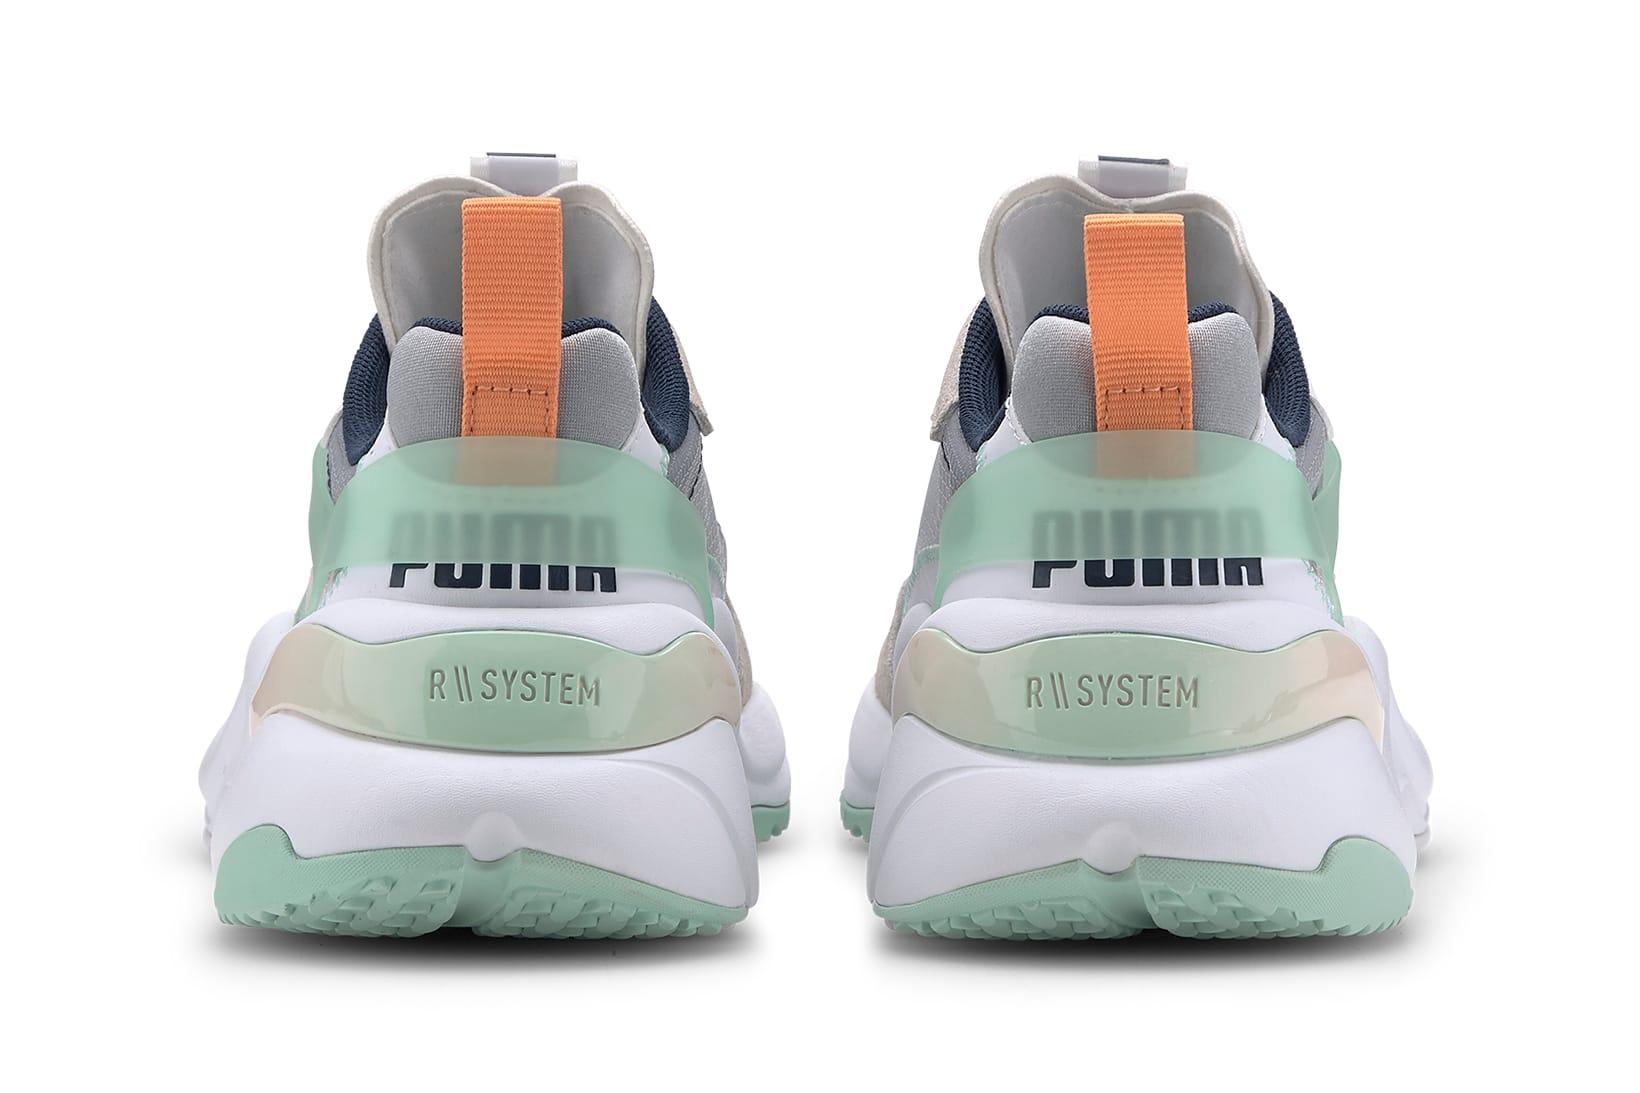 the latest puma shoes